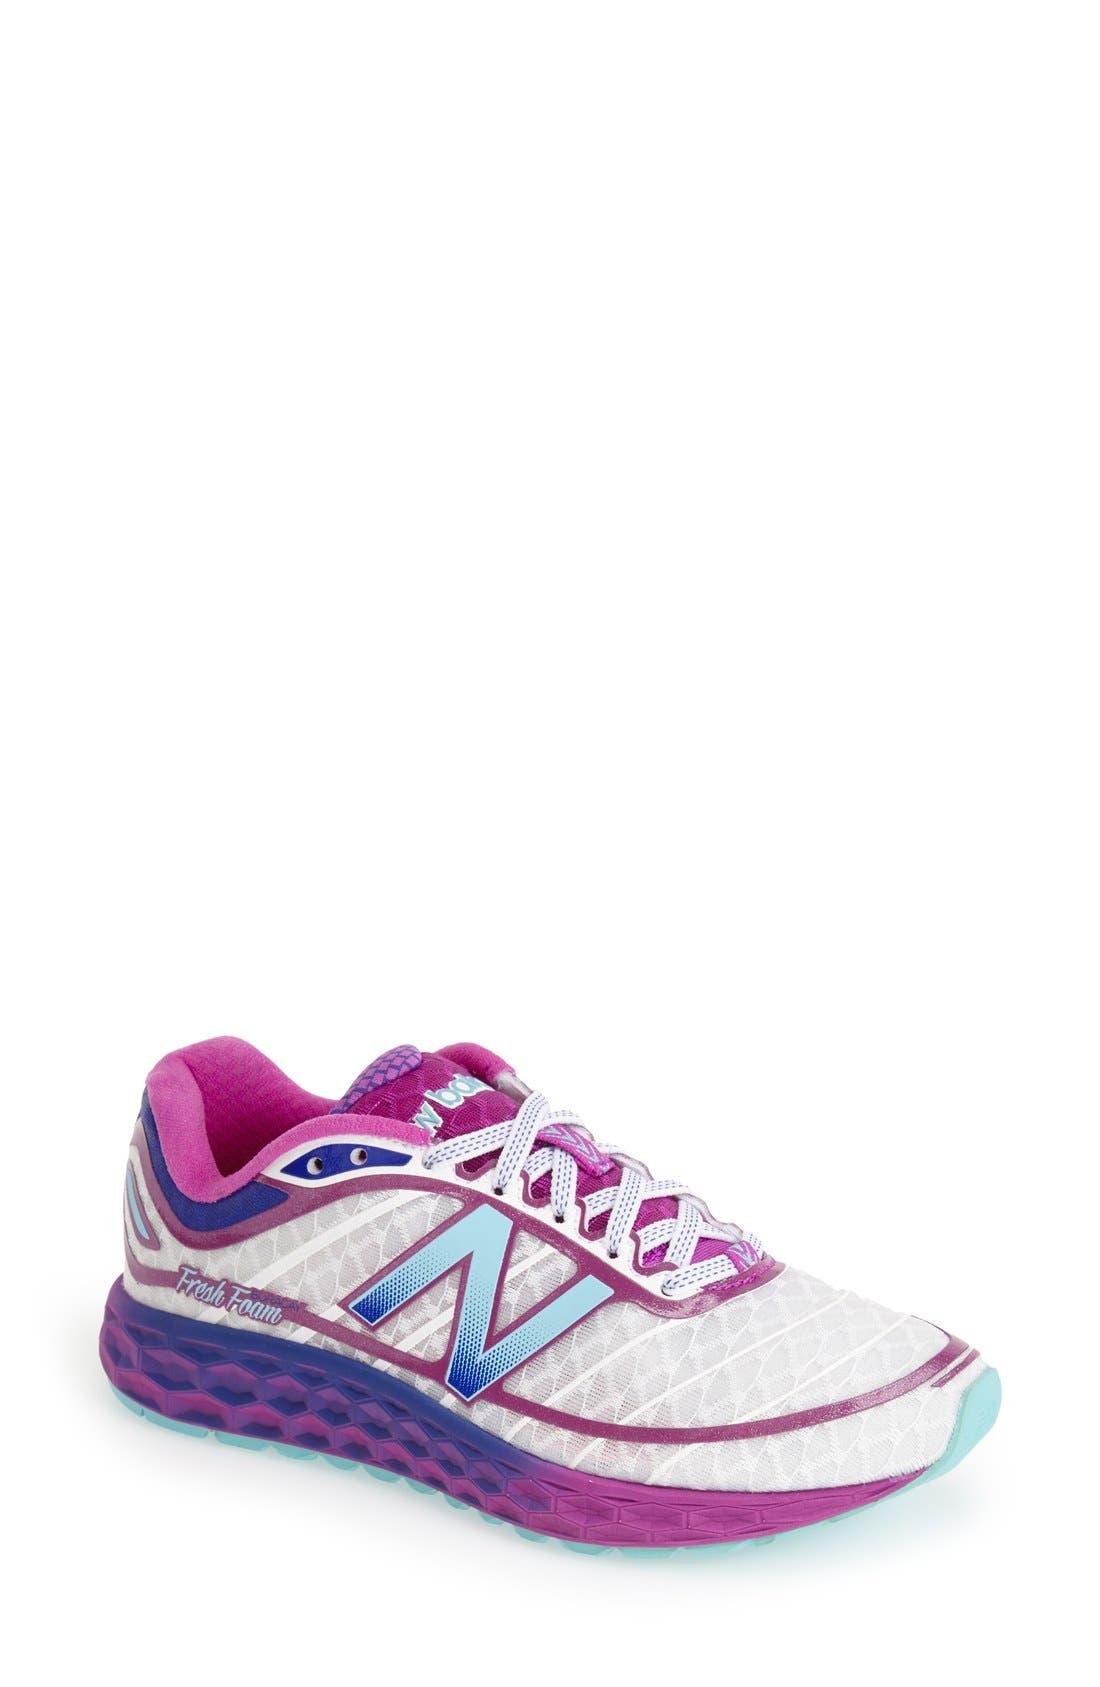 Alternate Image 1 Selected - New Balance '980' Running Shoe (Women)